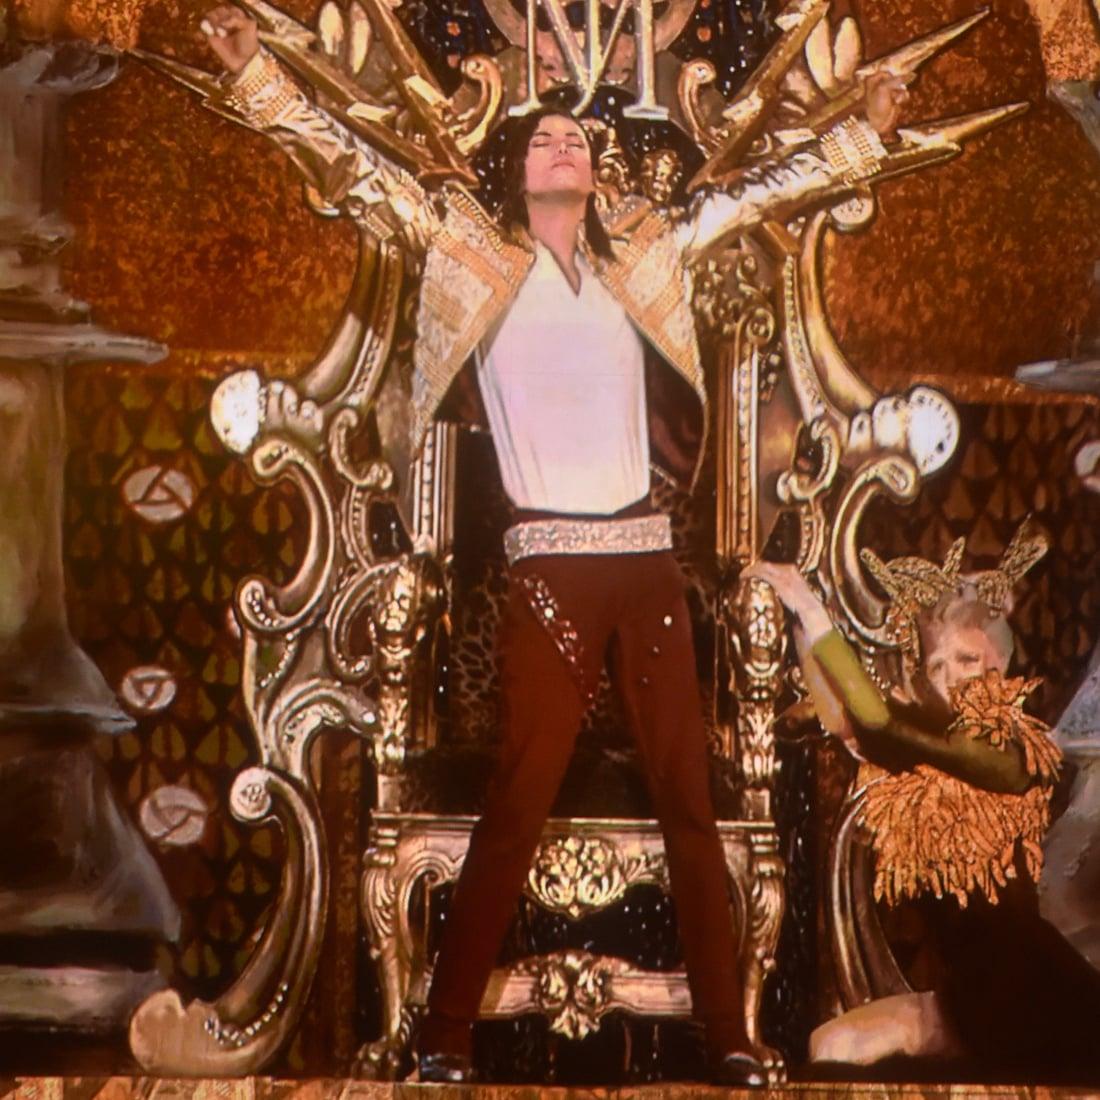 Michael Jackson Hologram at 2014 Billboard Music Awards | POPSUGAR